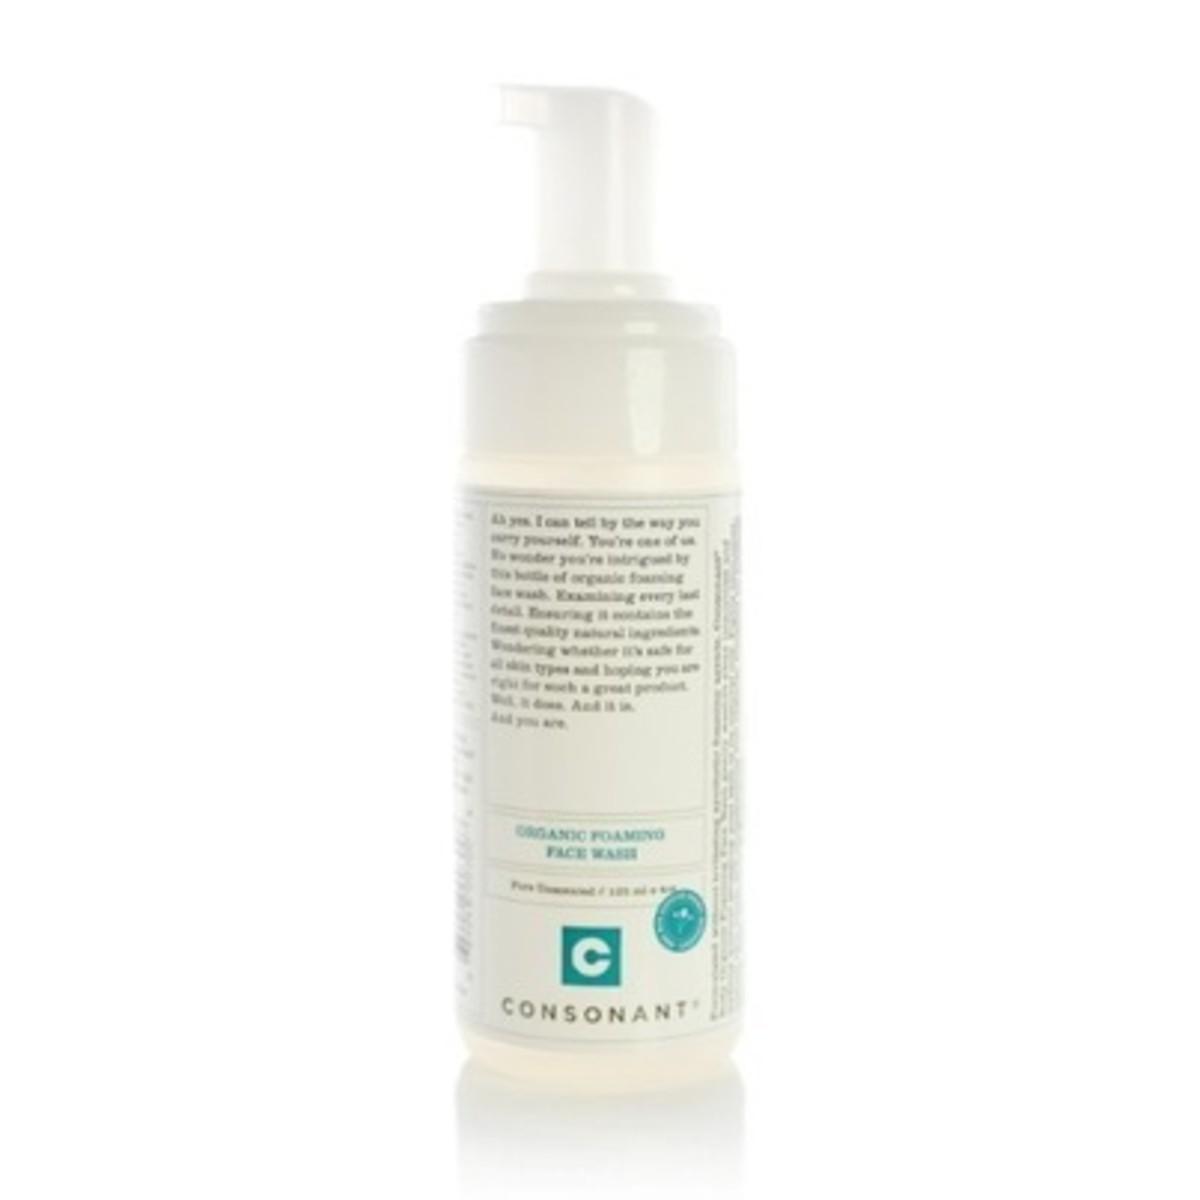 Consonant Organic Foaming Face Wash